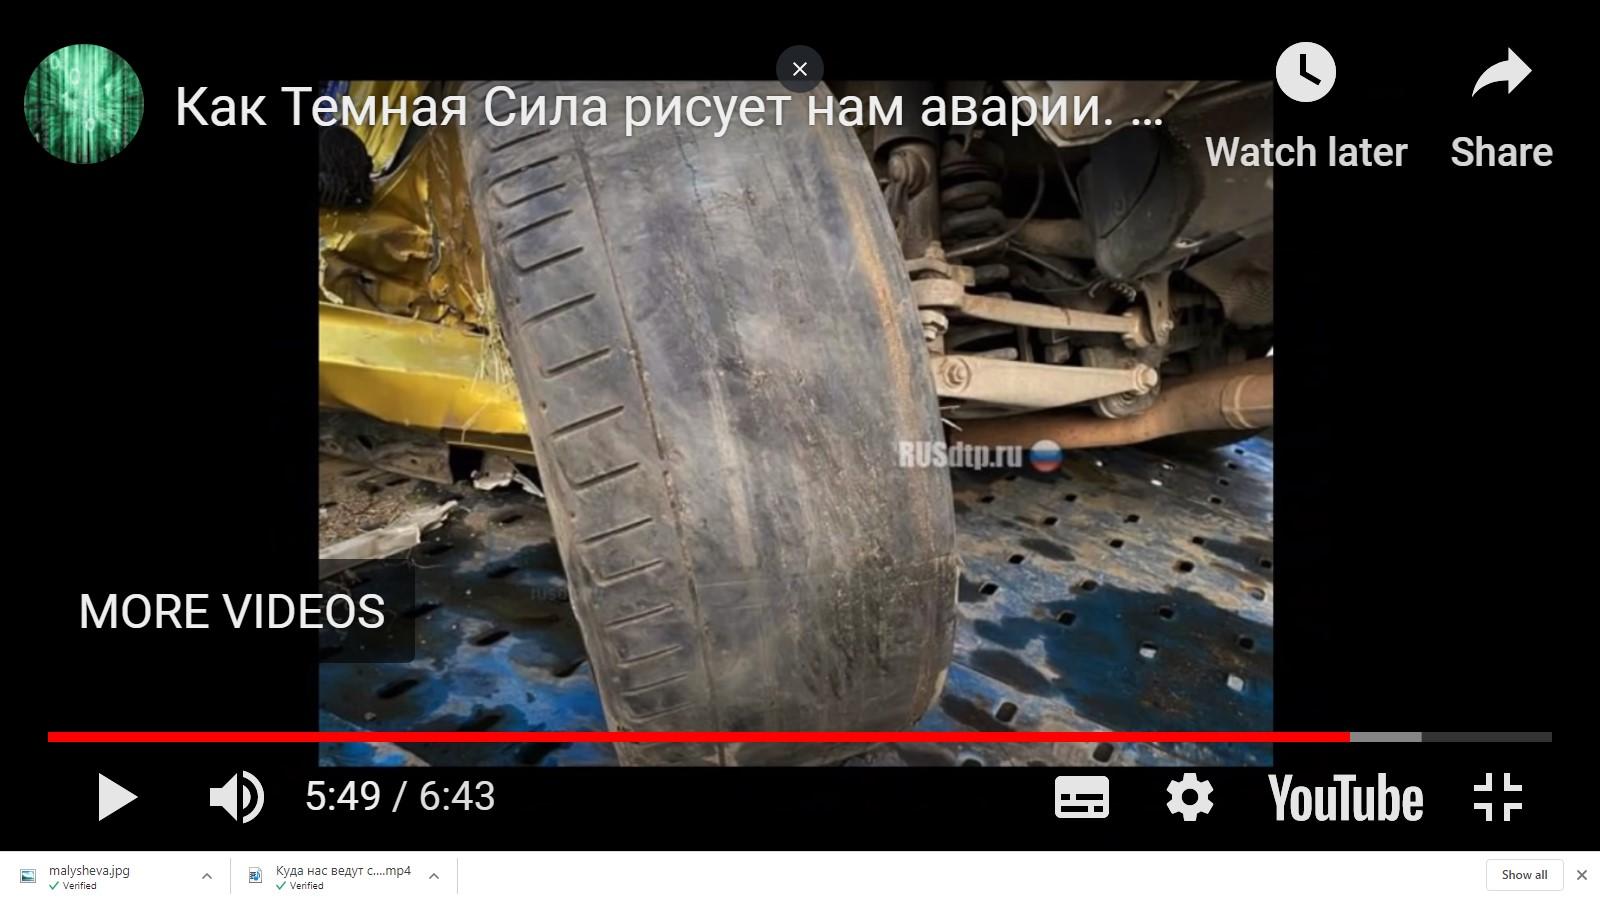 http://images.vfl.ru/ii/1601025147/16fb0e31/31738774.jpg